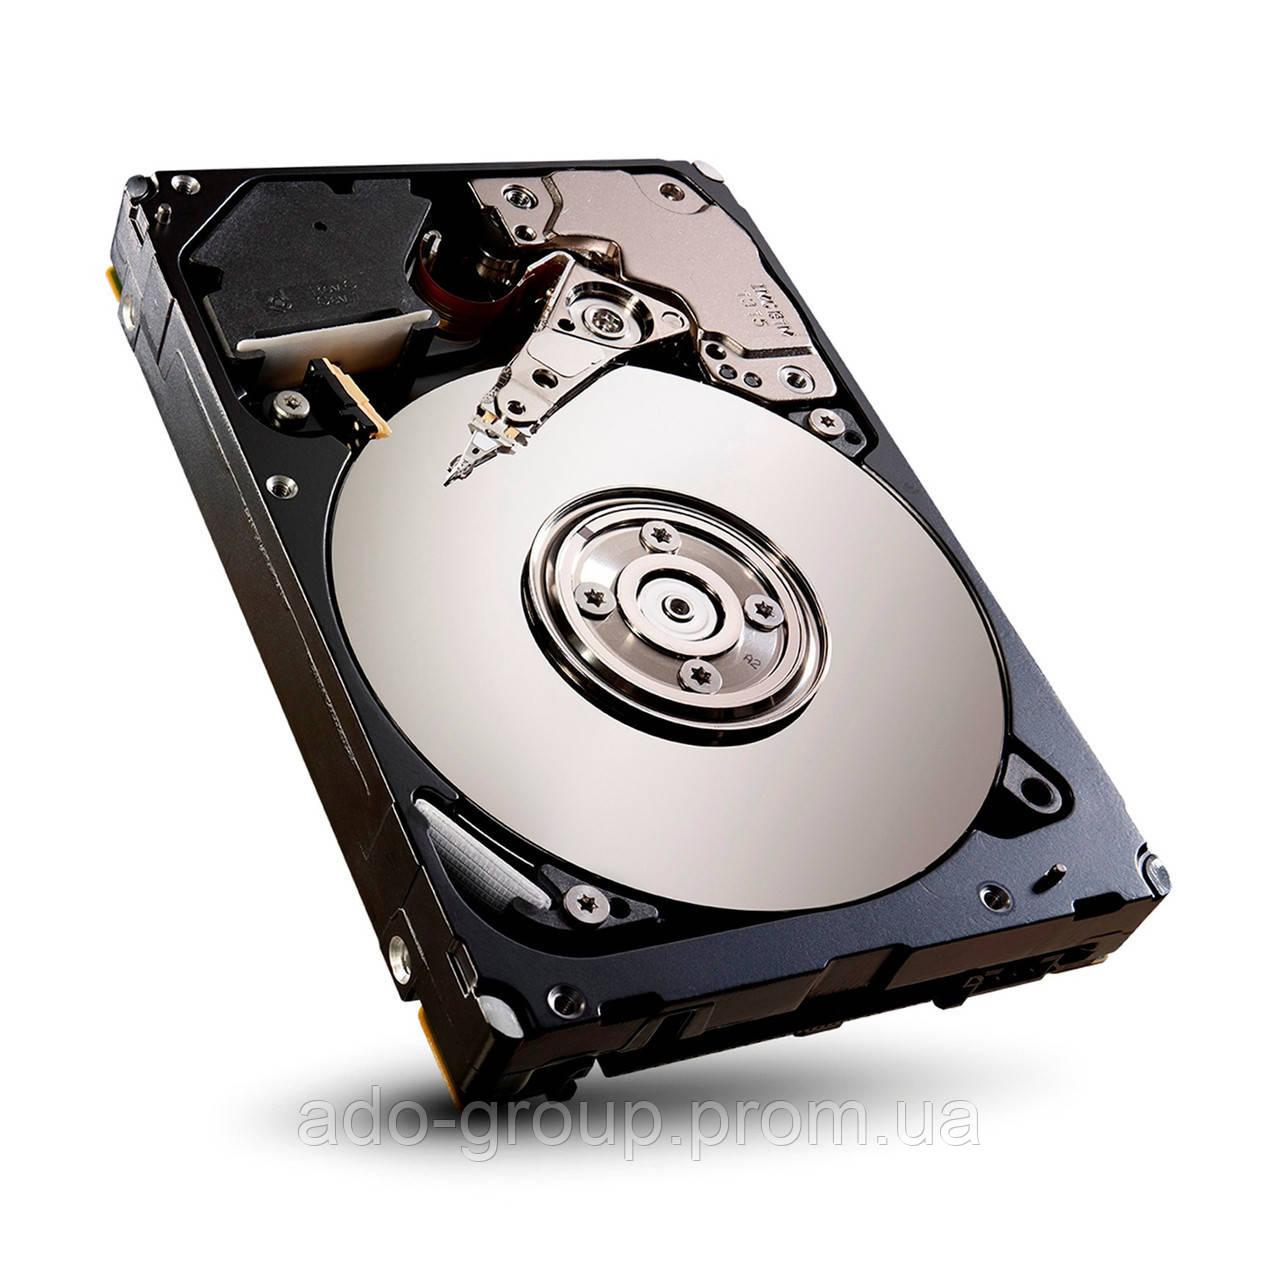 "737571-001 Жесткий диск HP 300Gb SAS 15K  3.5"" +"